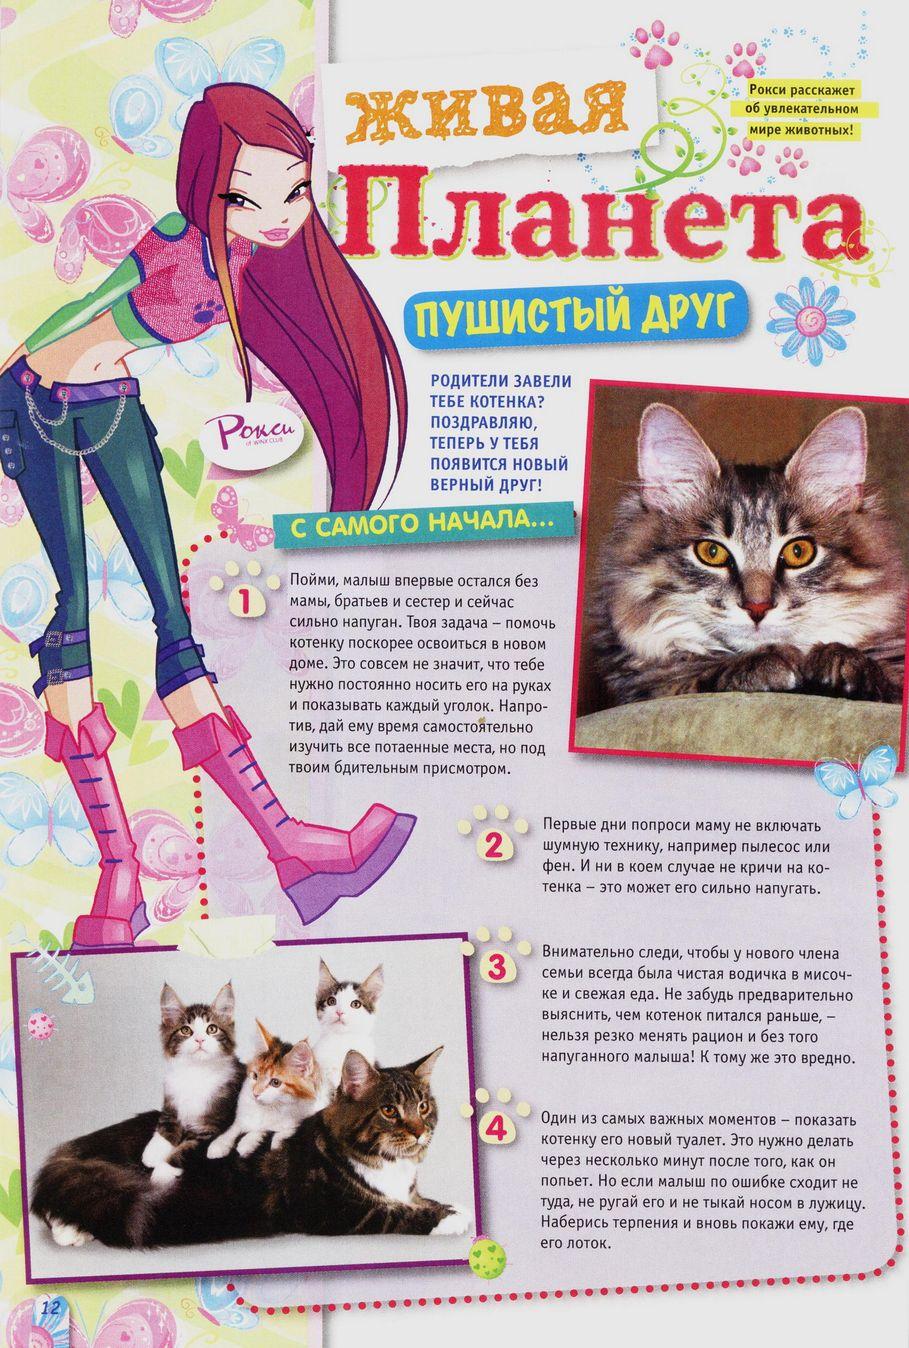 Комикс Винкс Winx - Волшебник Камуд (Журнал Винкс №6 2011) - стр. 12